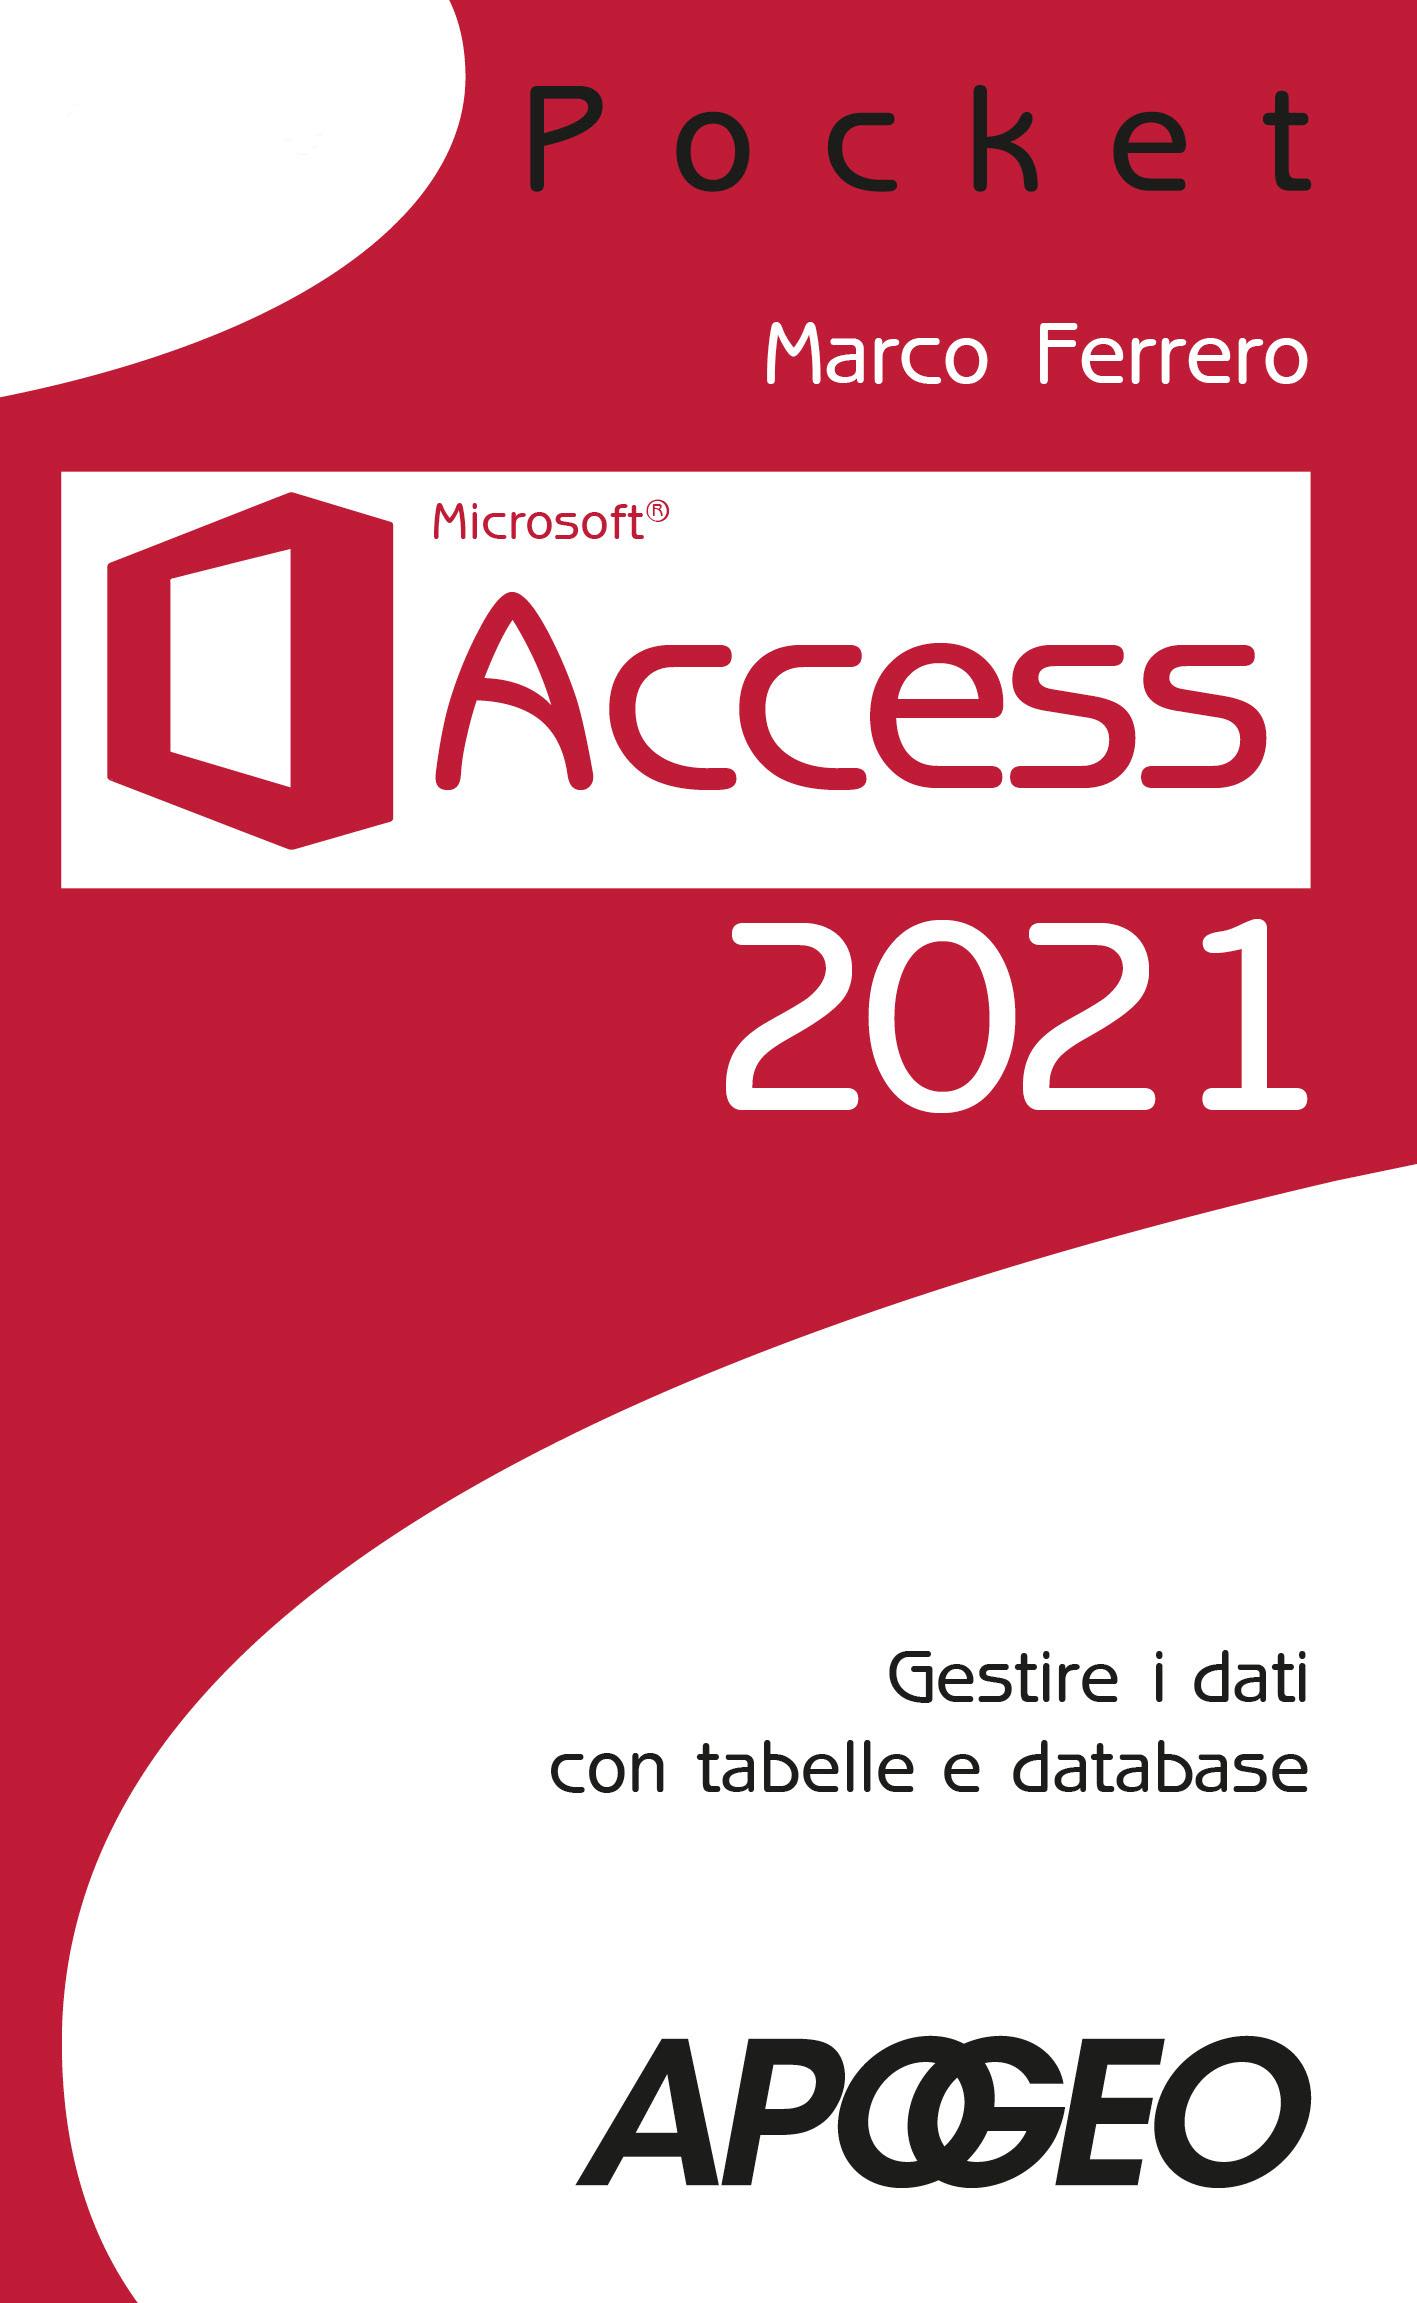 Access 2021 copertina